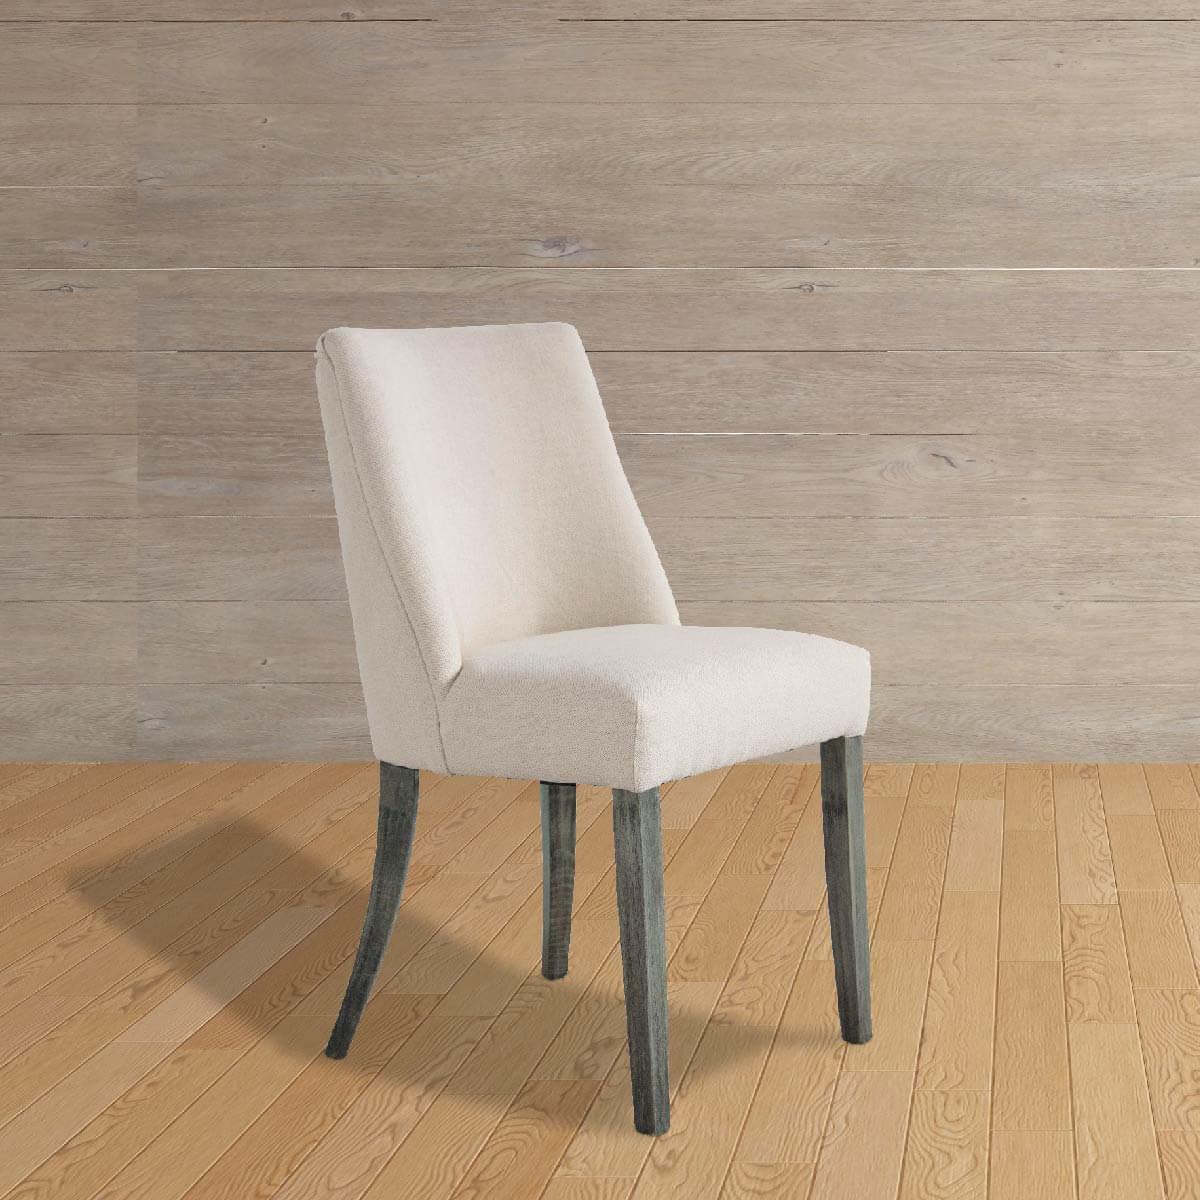 Tiffany Dining Chair Cozy Home Dubai